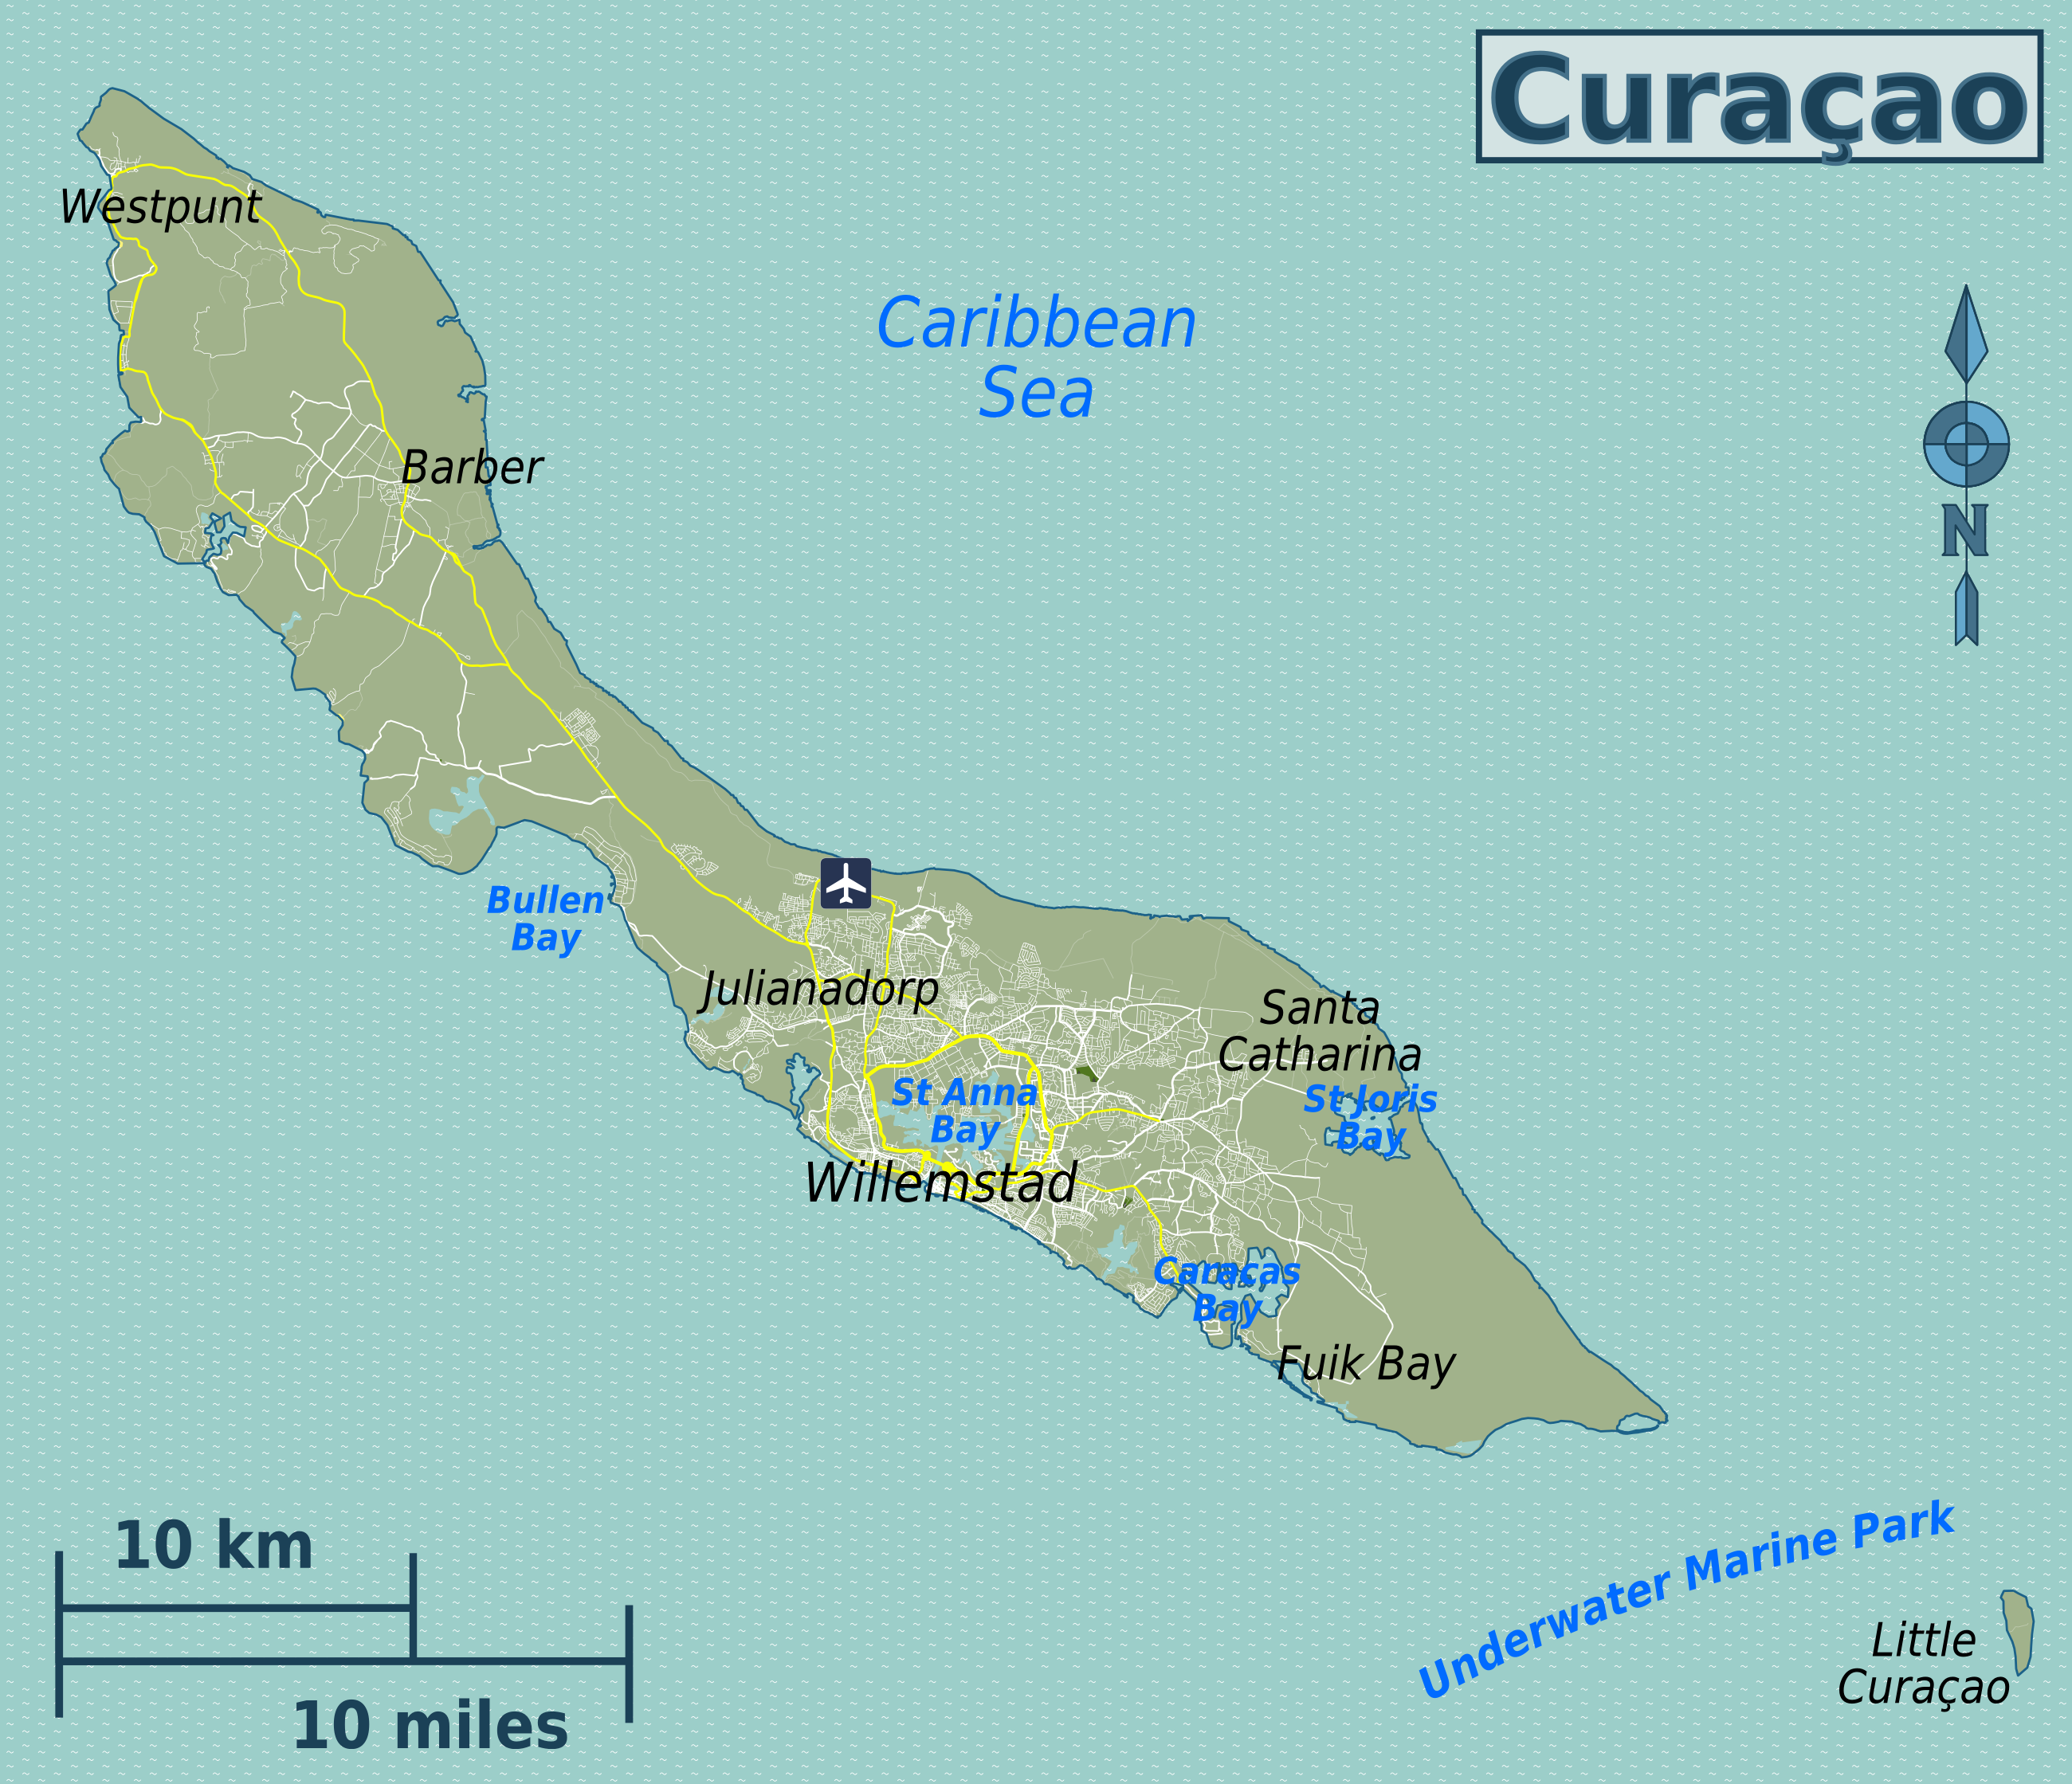 Curacao Island Map